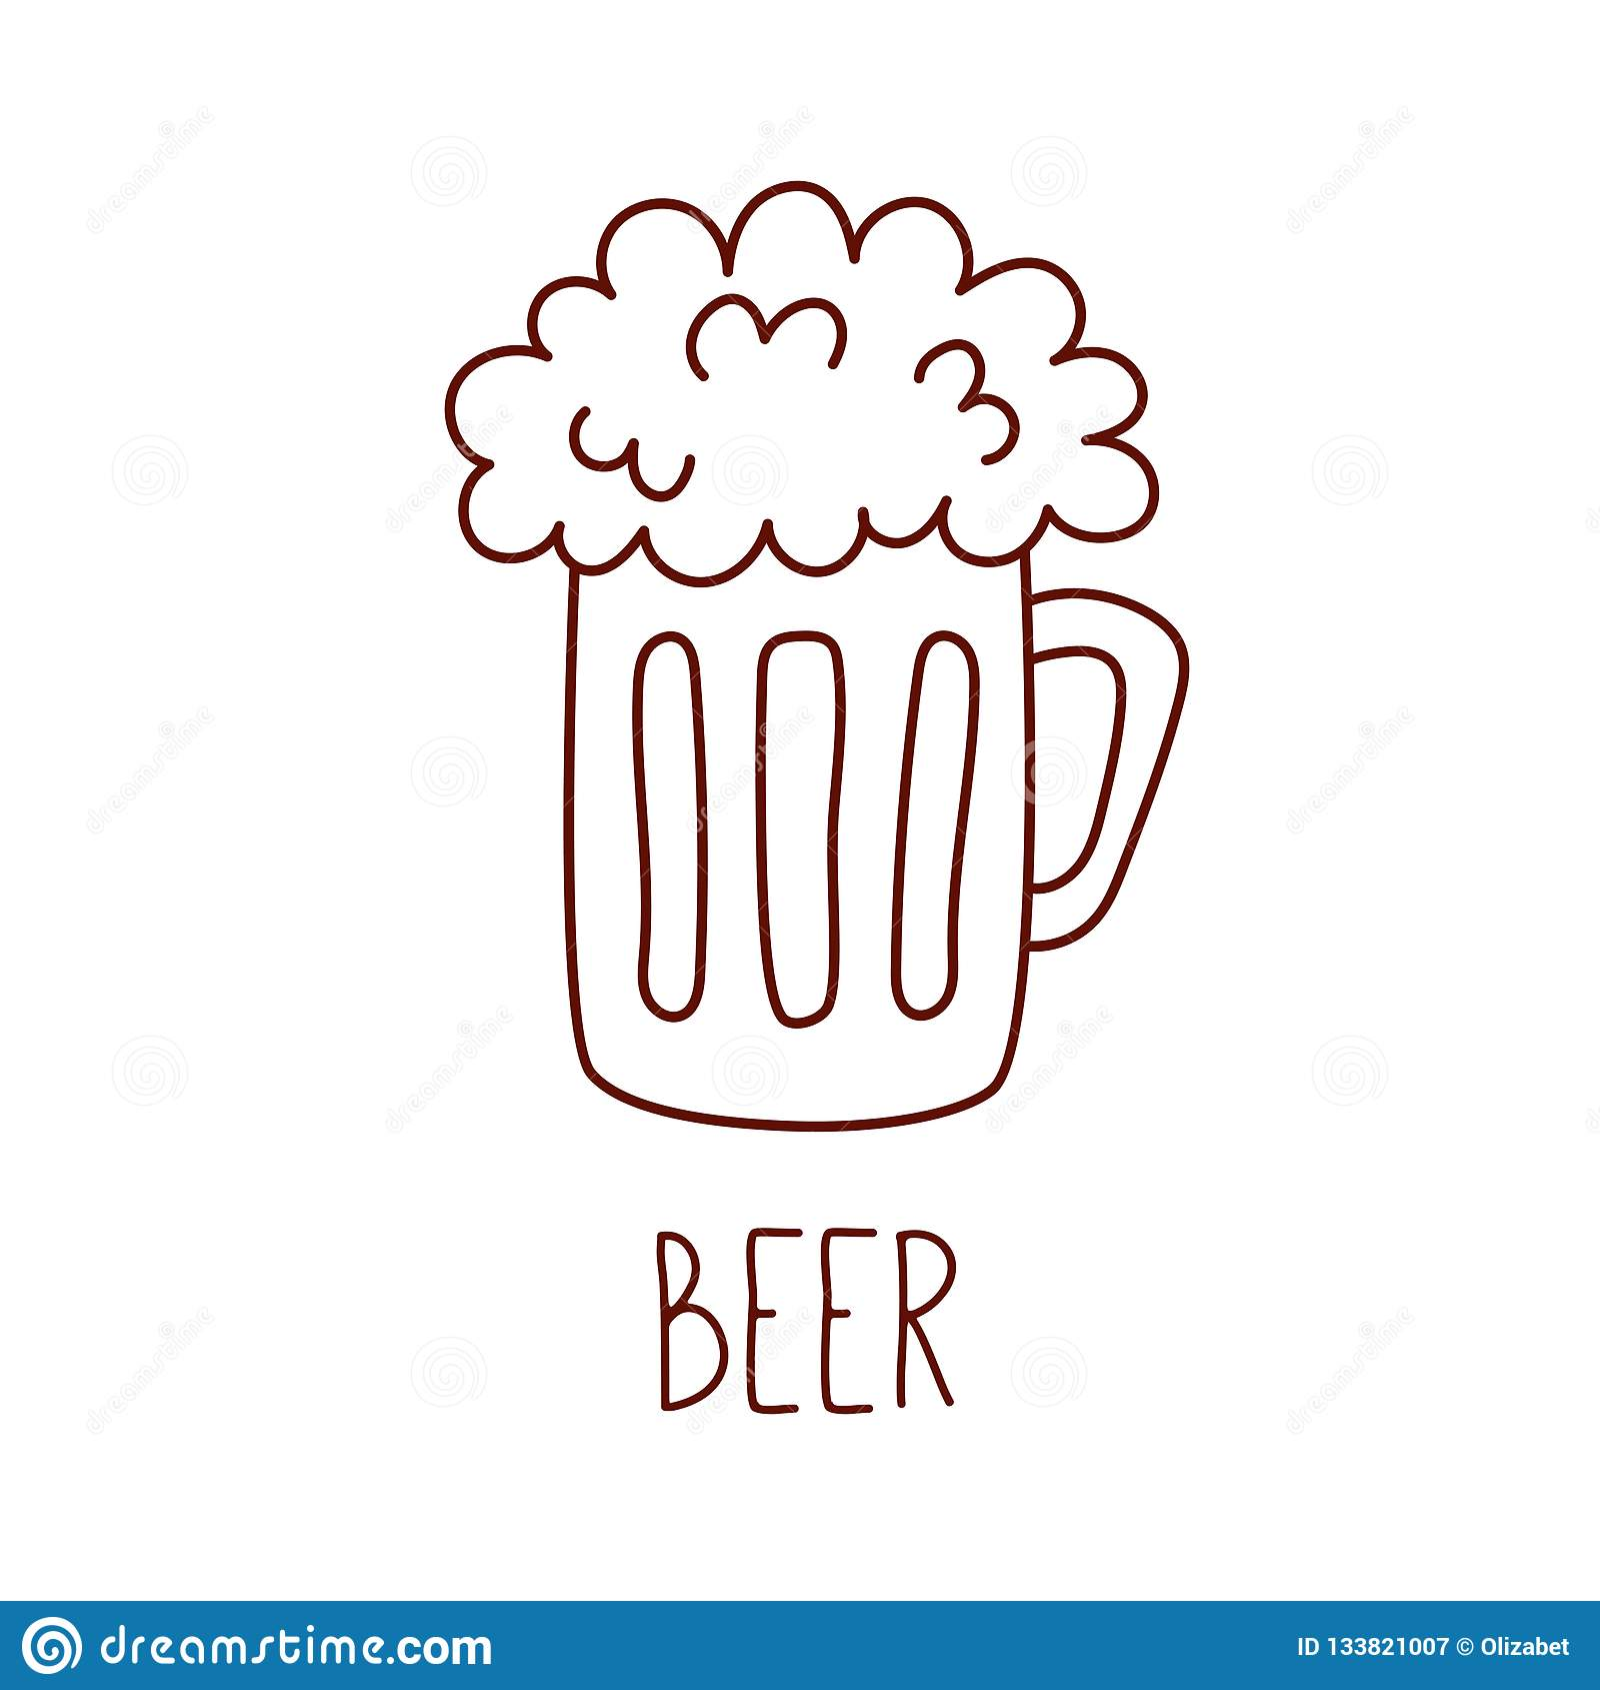 Beer Mug Drink Doodle Line Vector Icon Stock Vector Illustration Of Logo Icon 133821007